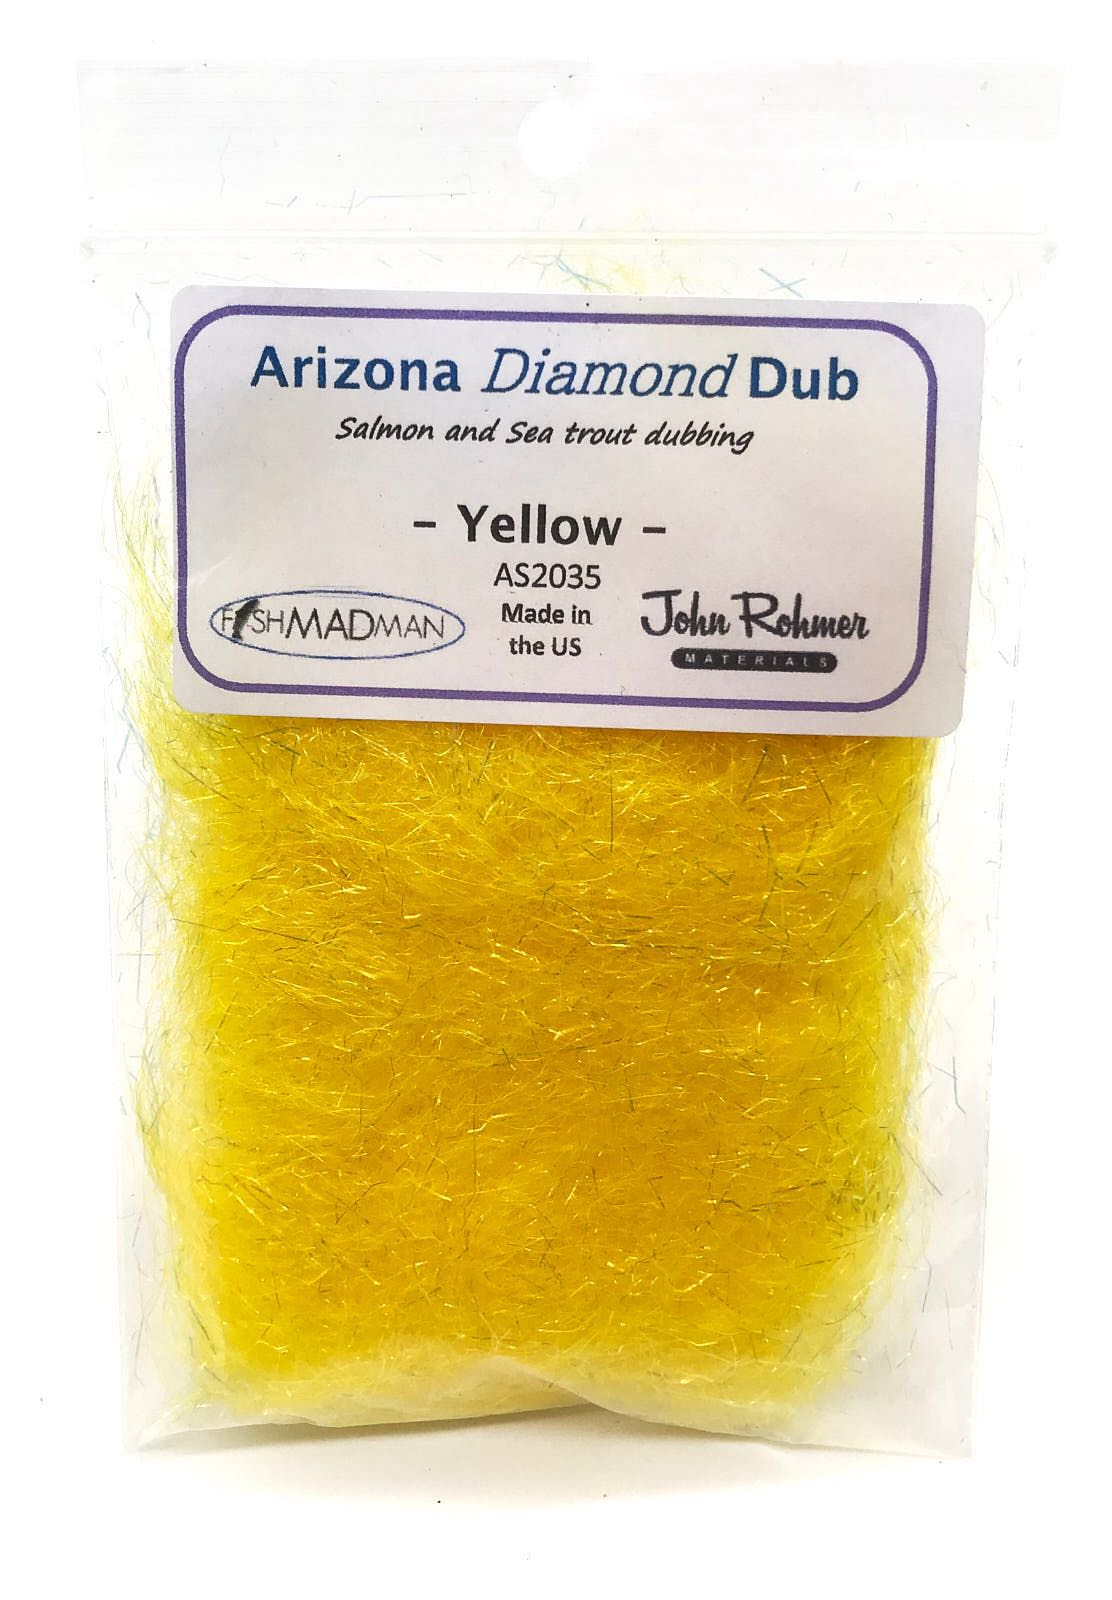 Arizona Diamond Dub yellow